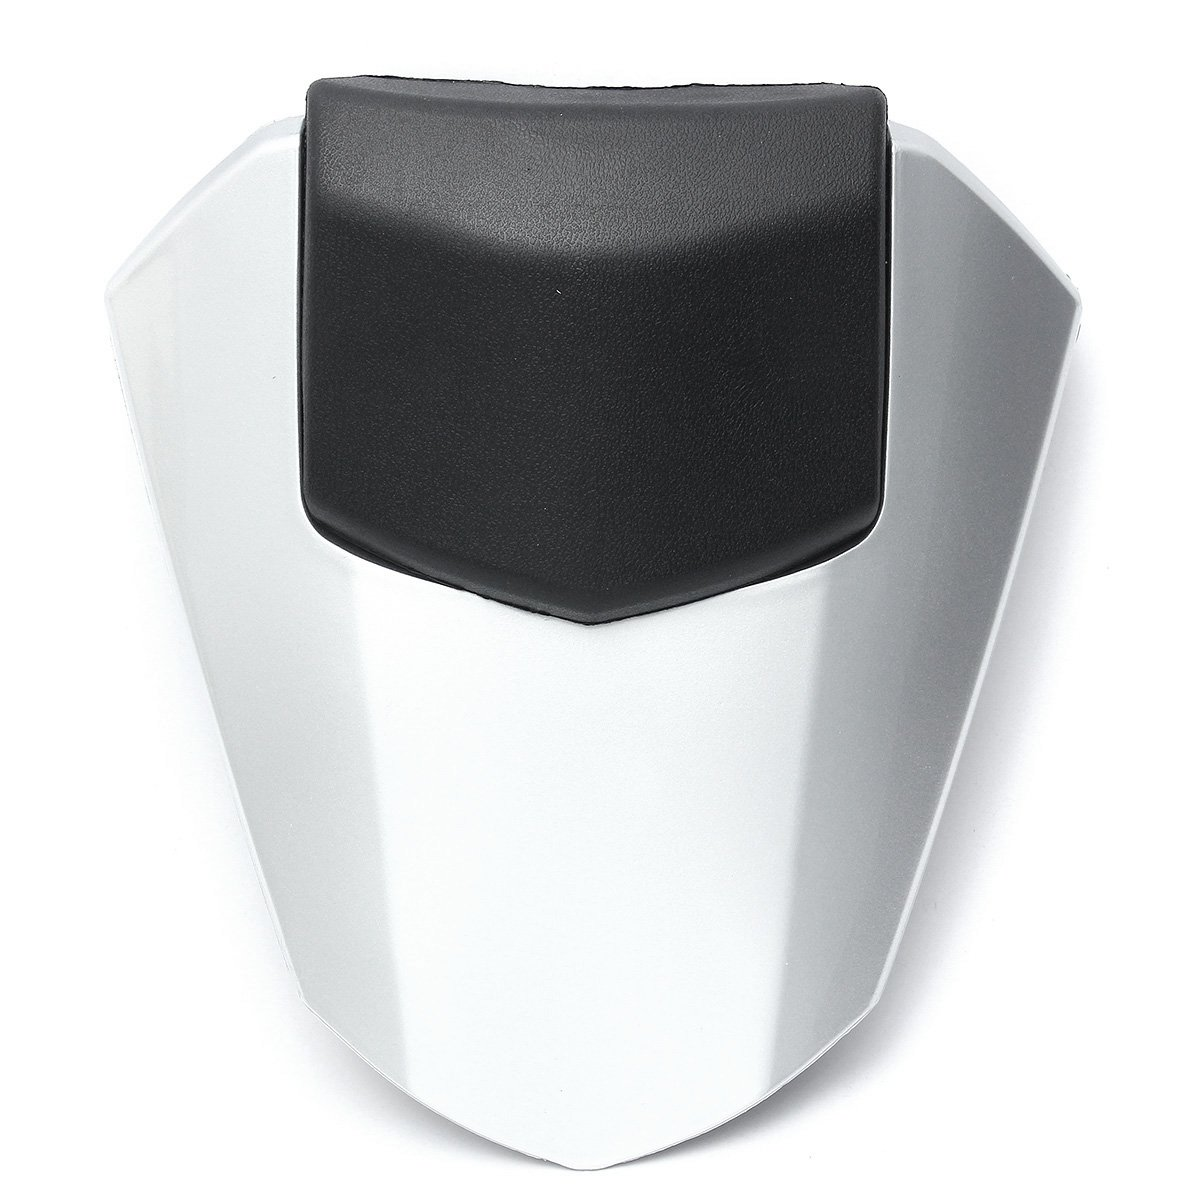 Negro JenNiFer Cubierta De Carenado Trasero De Asiento De Pillion para Yamaha YZF R6 2008-2015